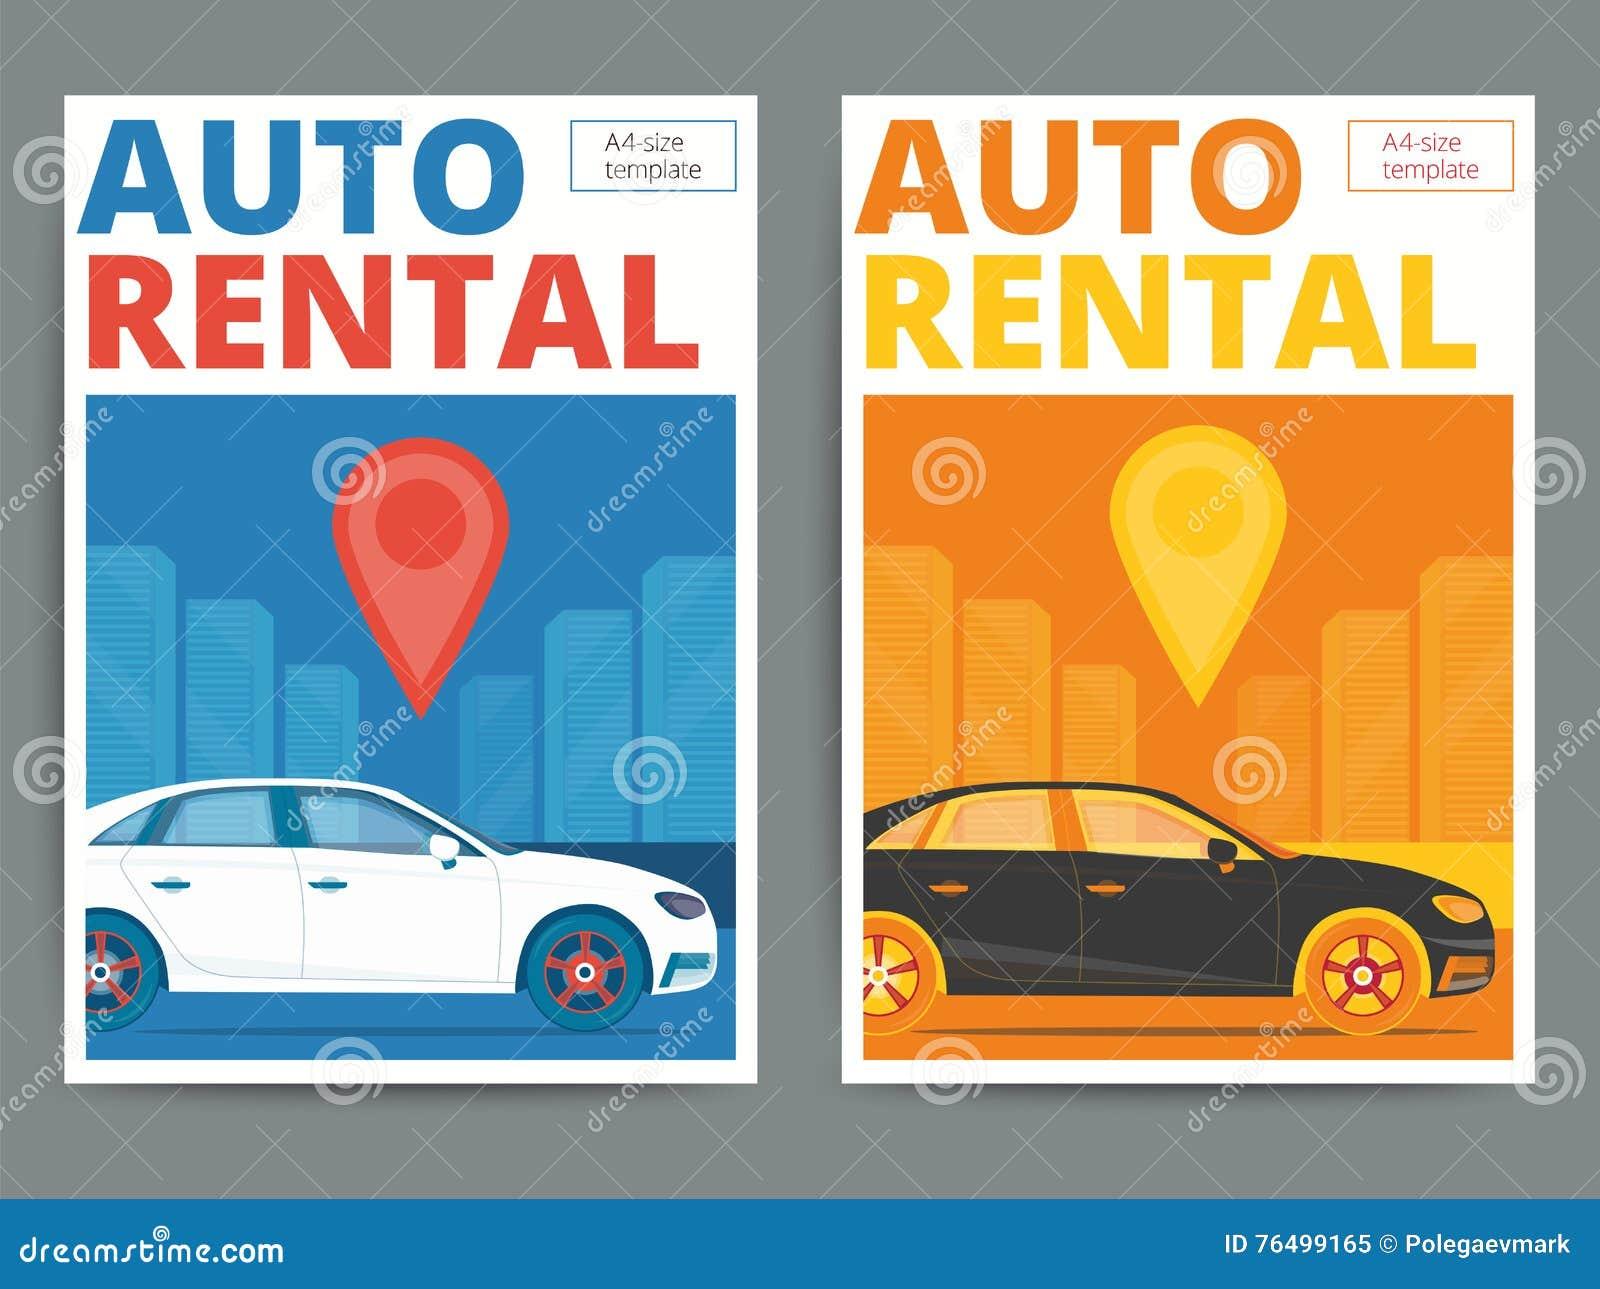 Trendy Poster Designs: Trendy Auto Rental Service Poster Design. Modern Vector